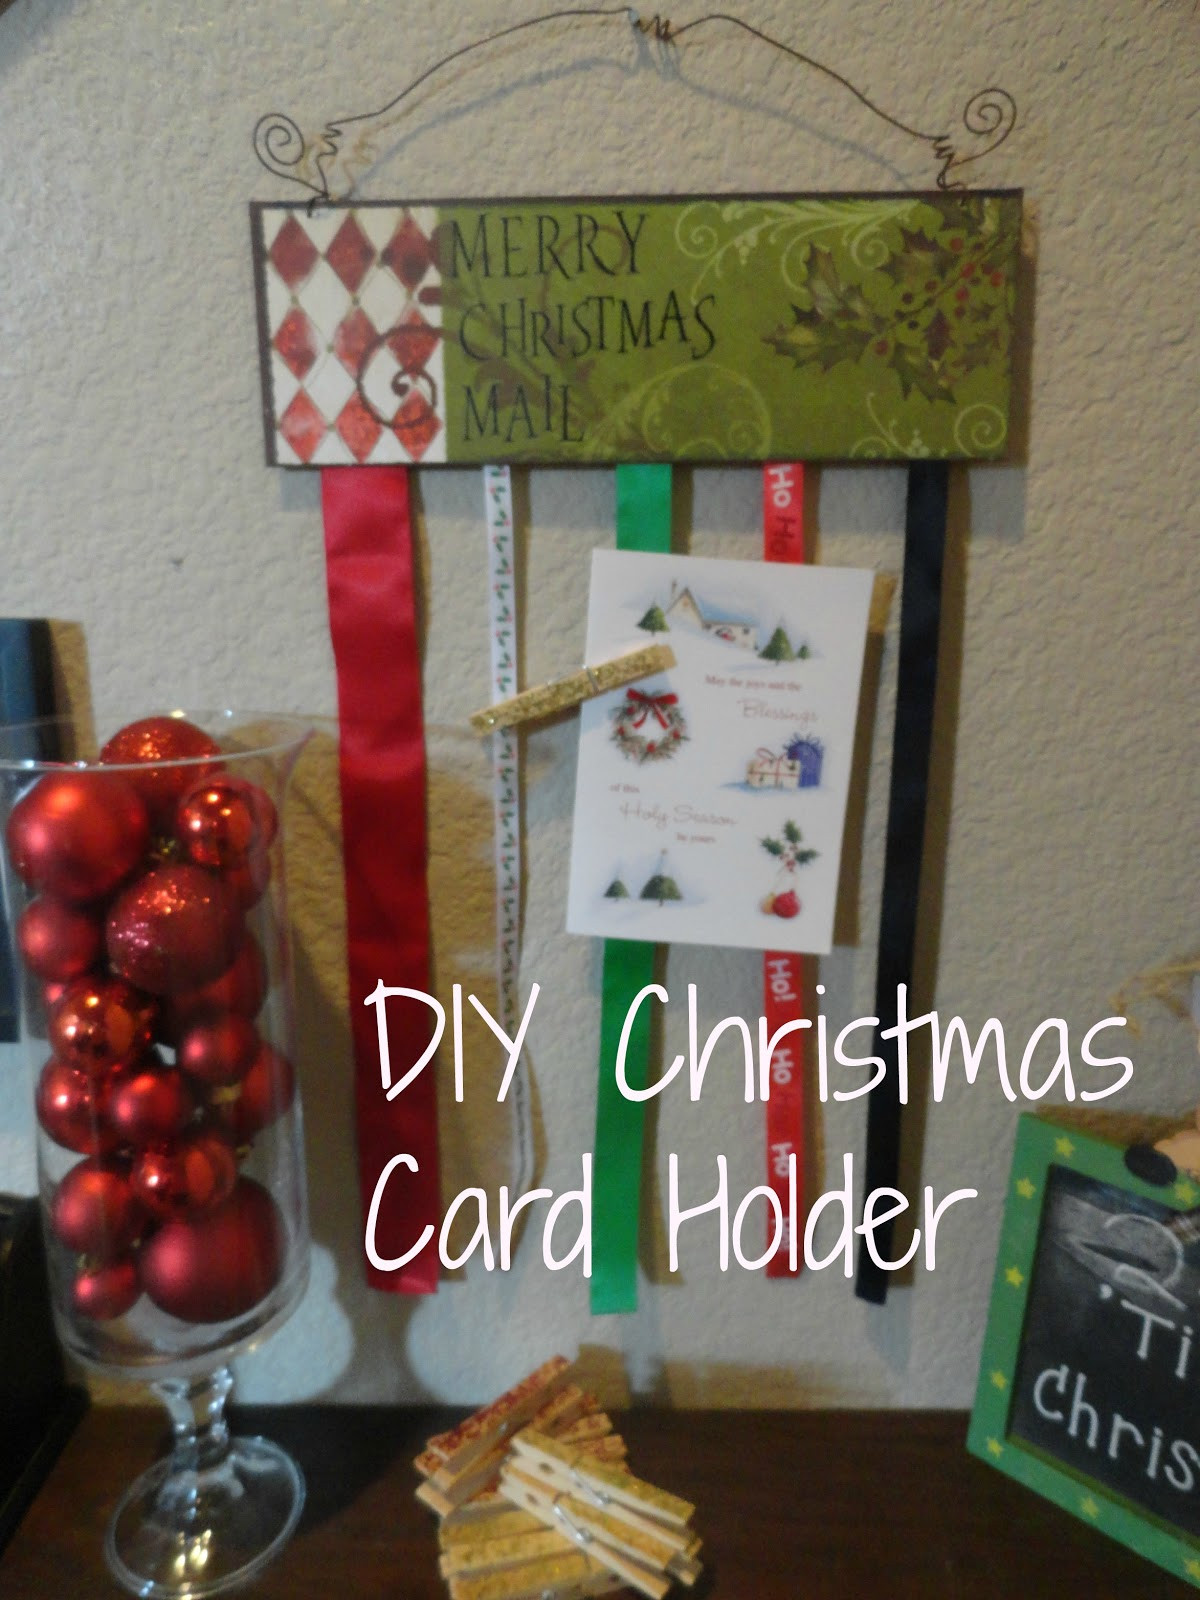 DIY Christmas Card Holders  So I Saw This Tutorial DIY Christmas Card Holder